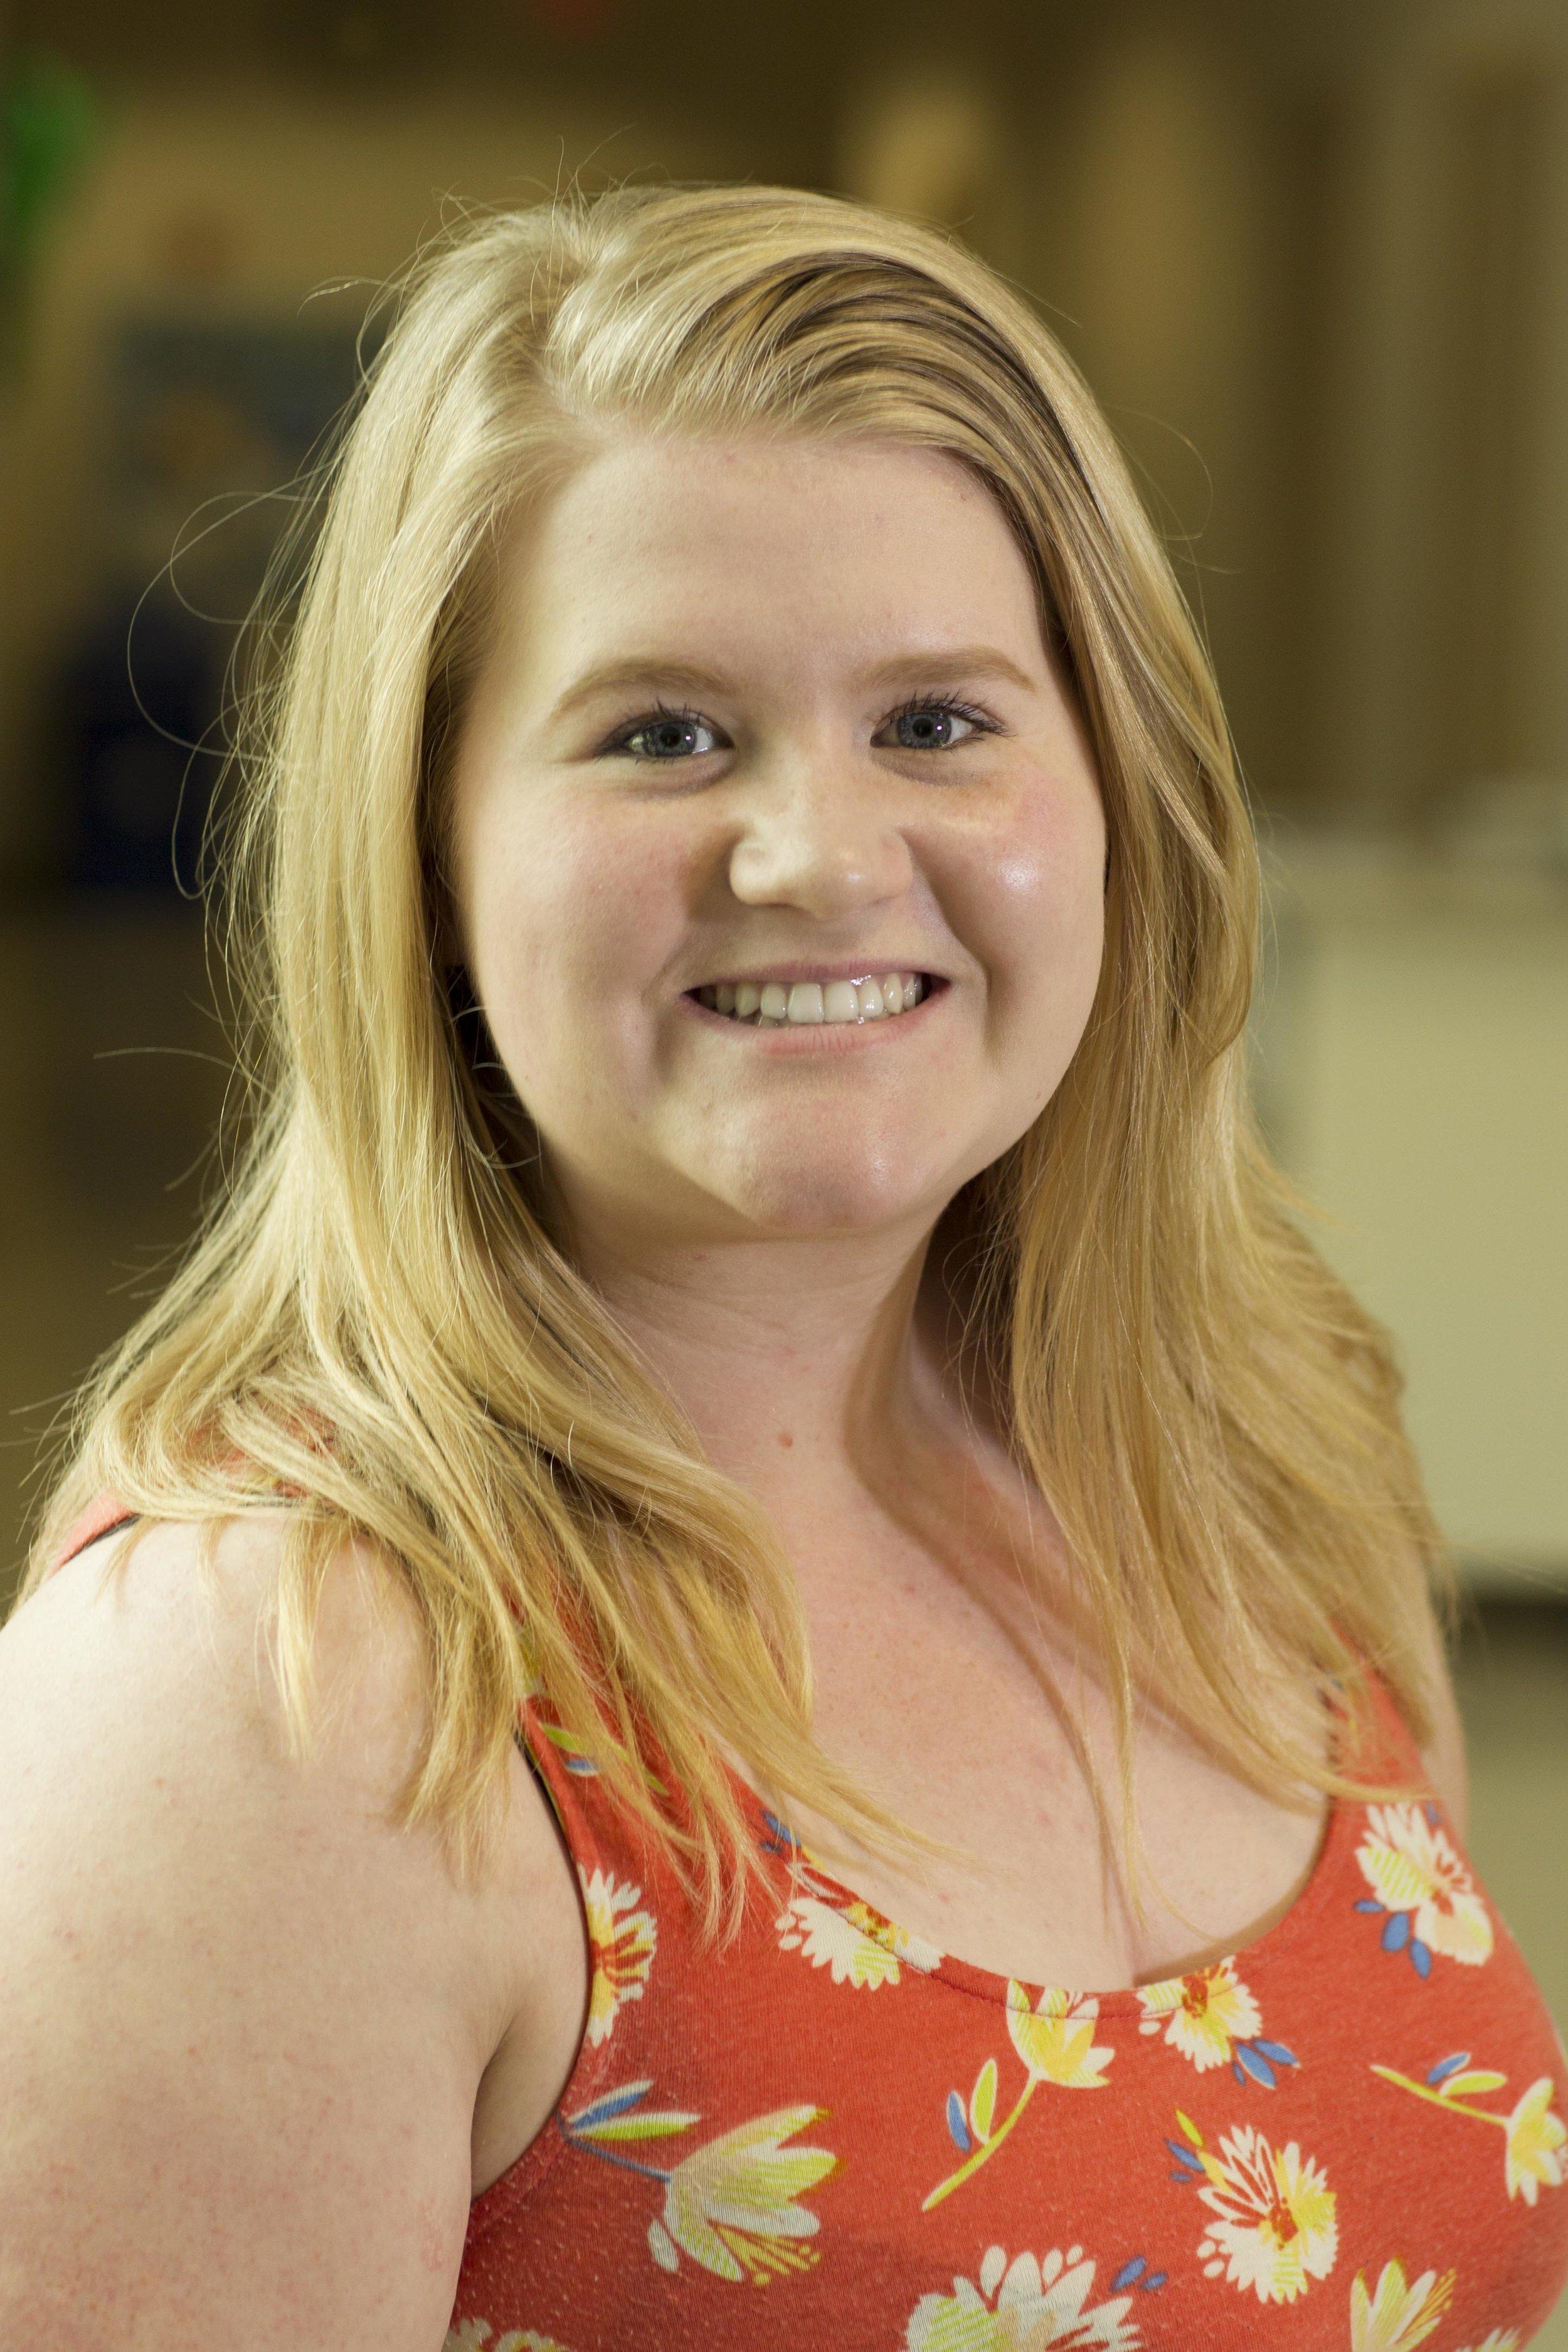 Assistant Editor | Bailee Wicks